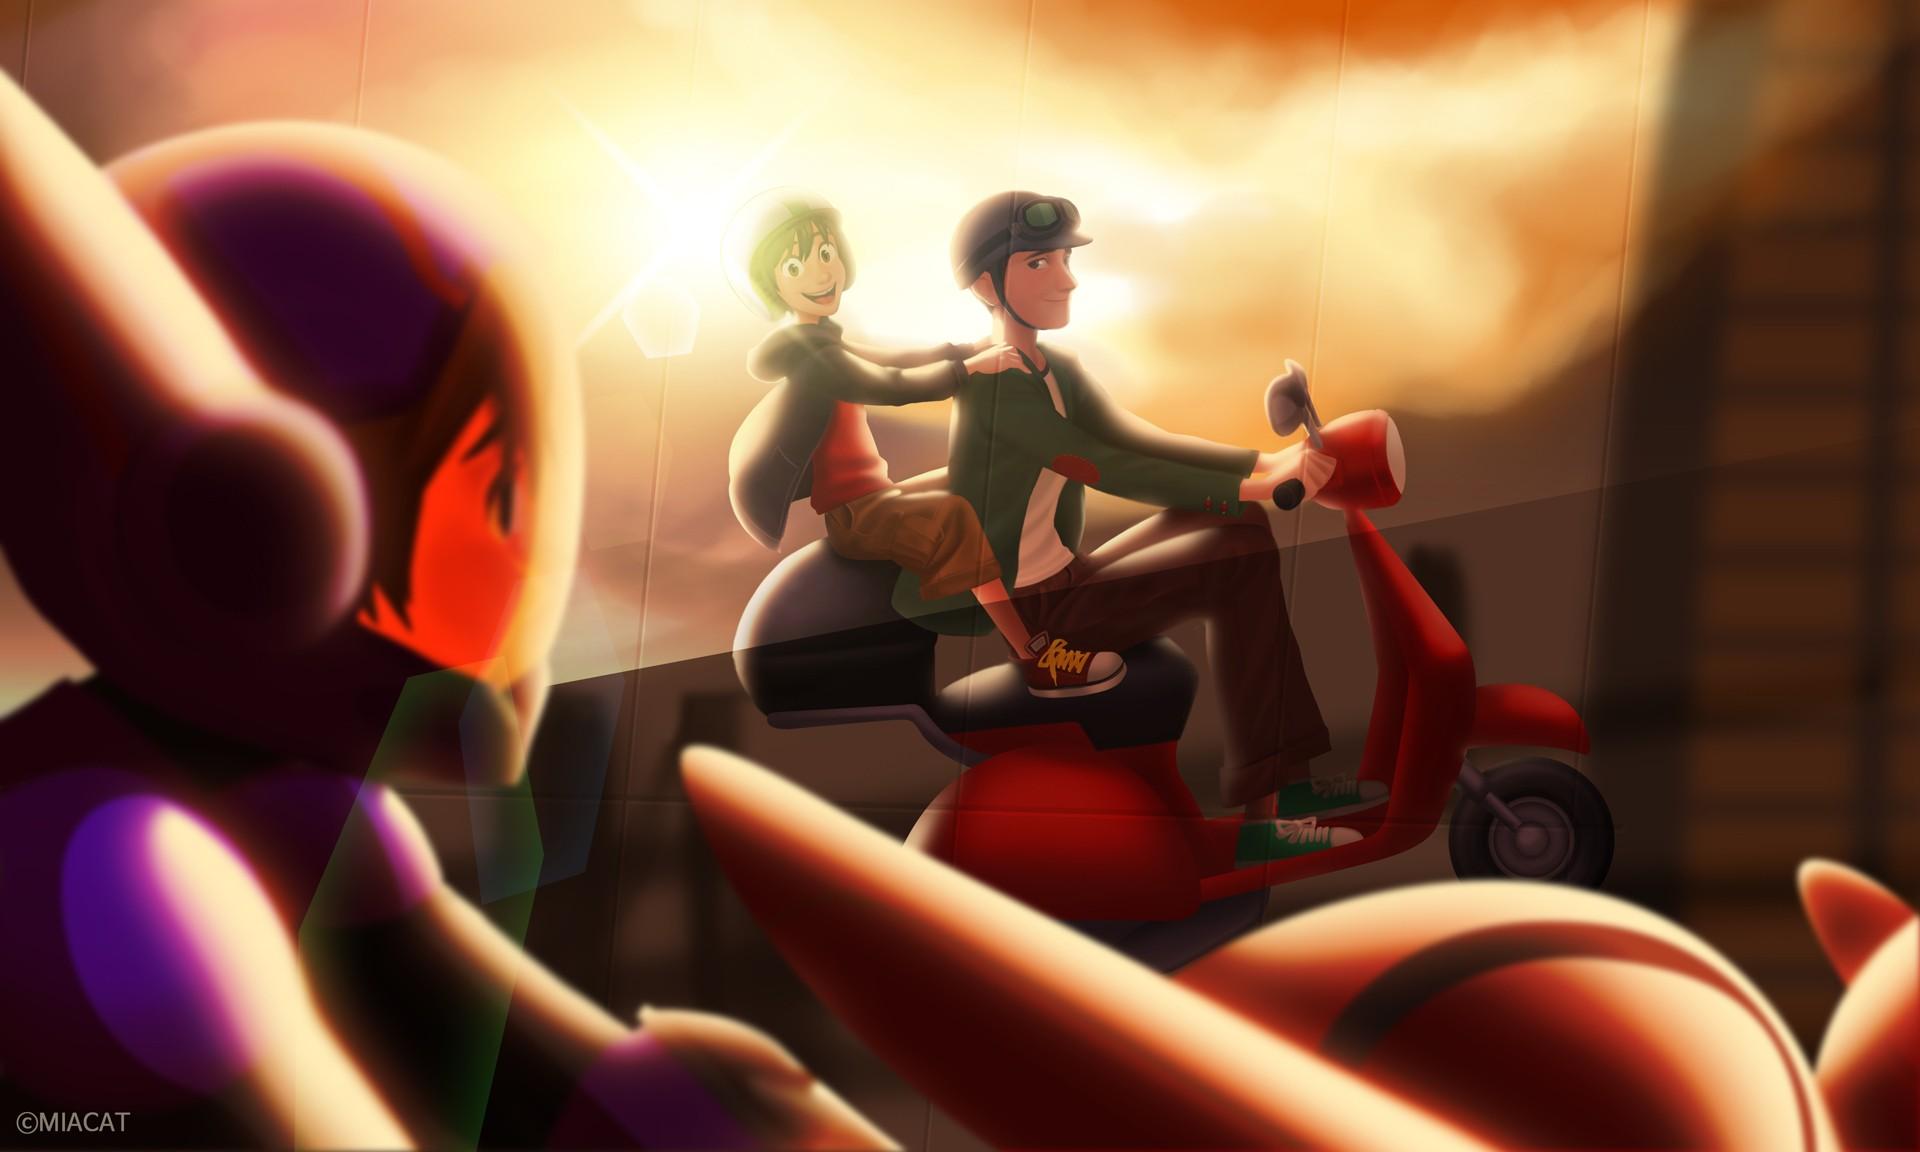 Movies Baymax Big Hero 6 Animated Disney Hiro Hamada